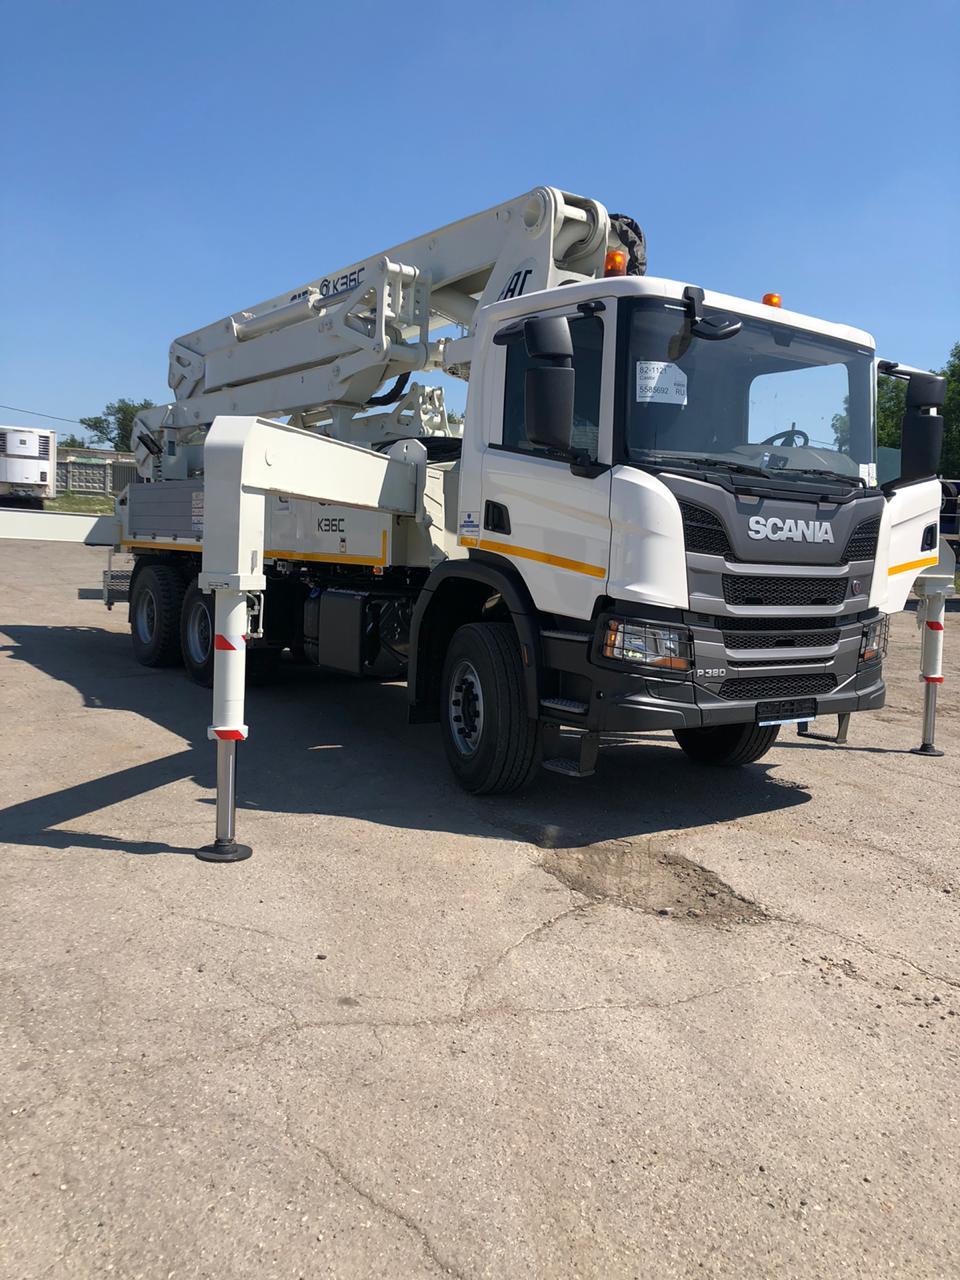 Точная синхронизация: шасси Scania с бетононасосом CIFA